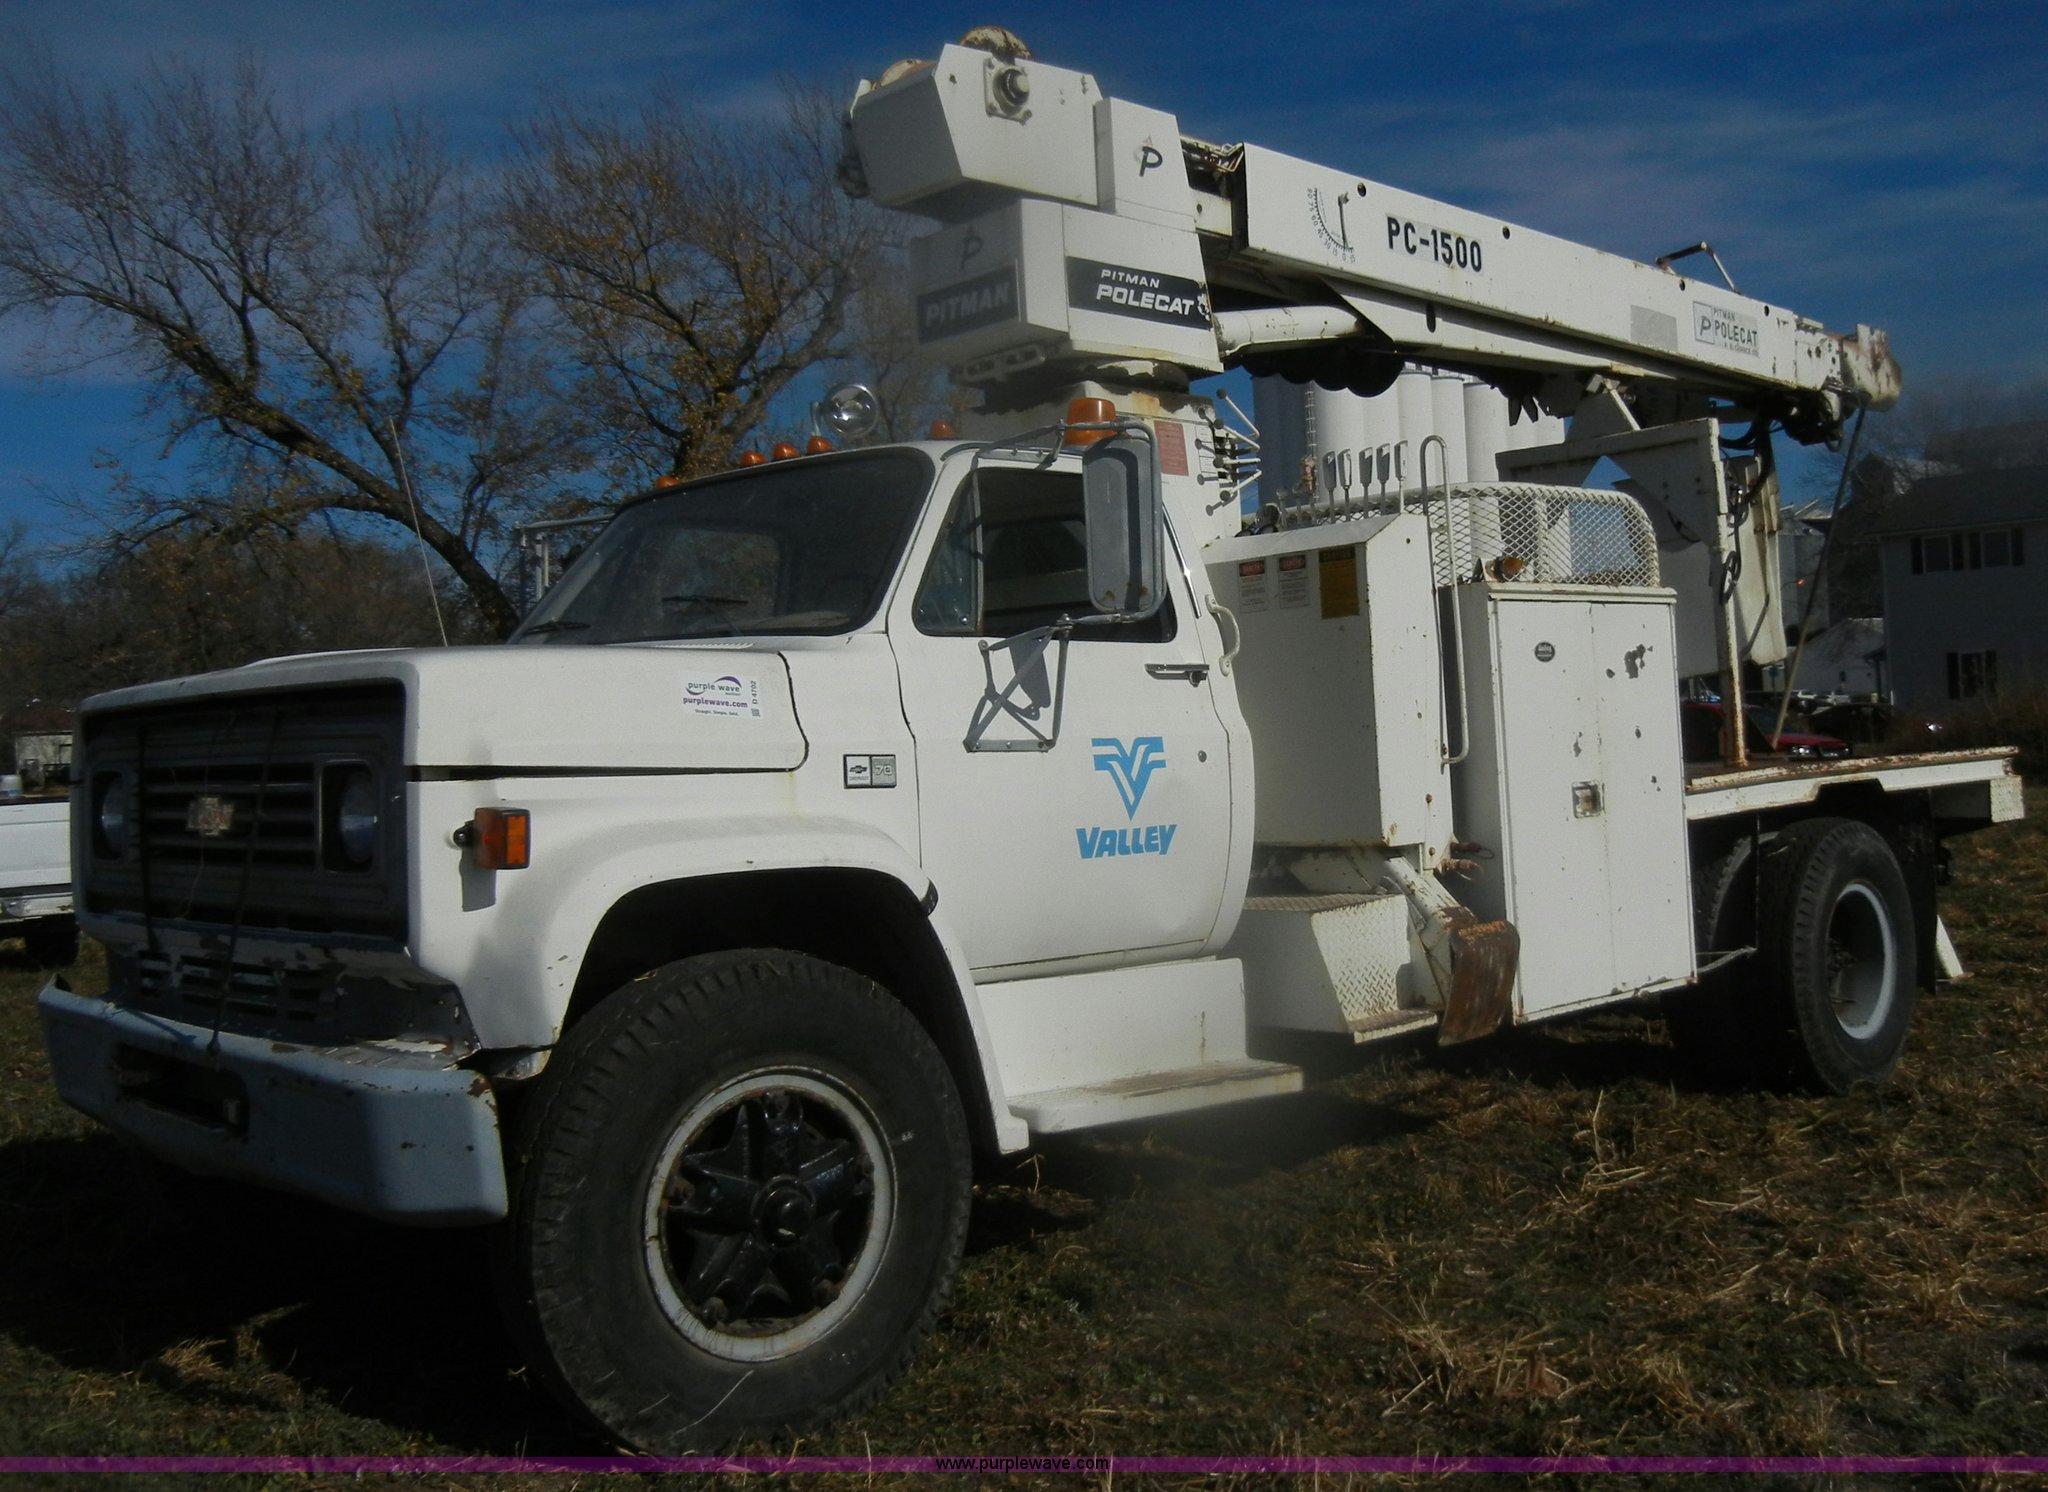 1983 chevrolet kodiak c70 pitman polecat flatbed truck ite rh purplewave com Pitman Bucket Trucks Pitman Bucket Trucks